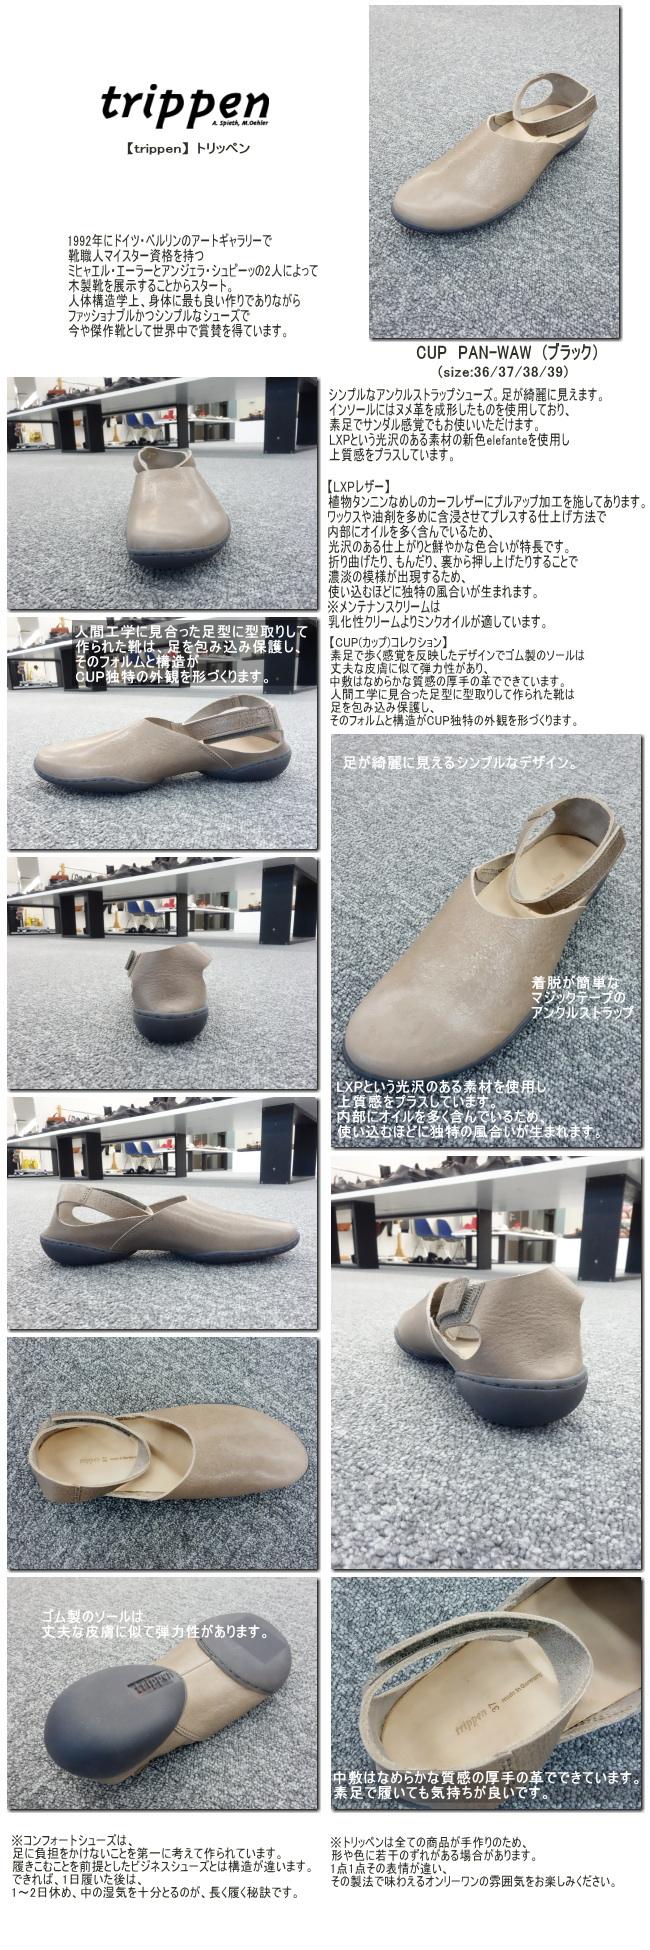 【trippen】アンクルストラップシューズ CUP PAN-LXP (グレー)